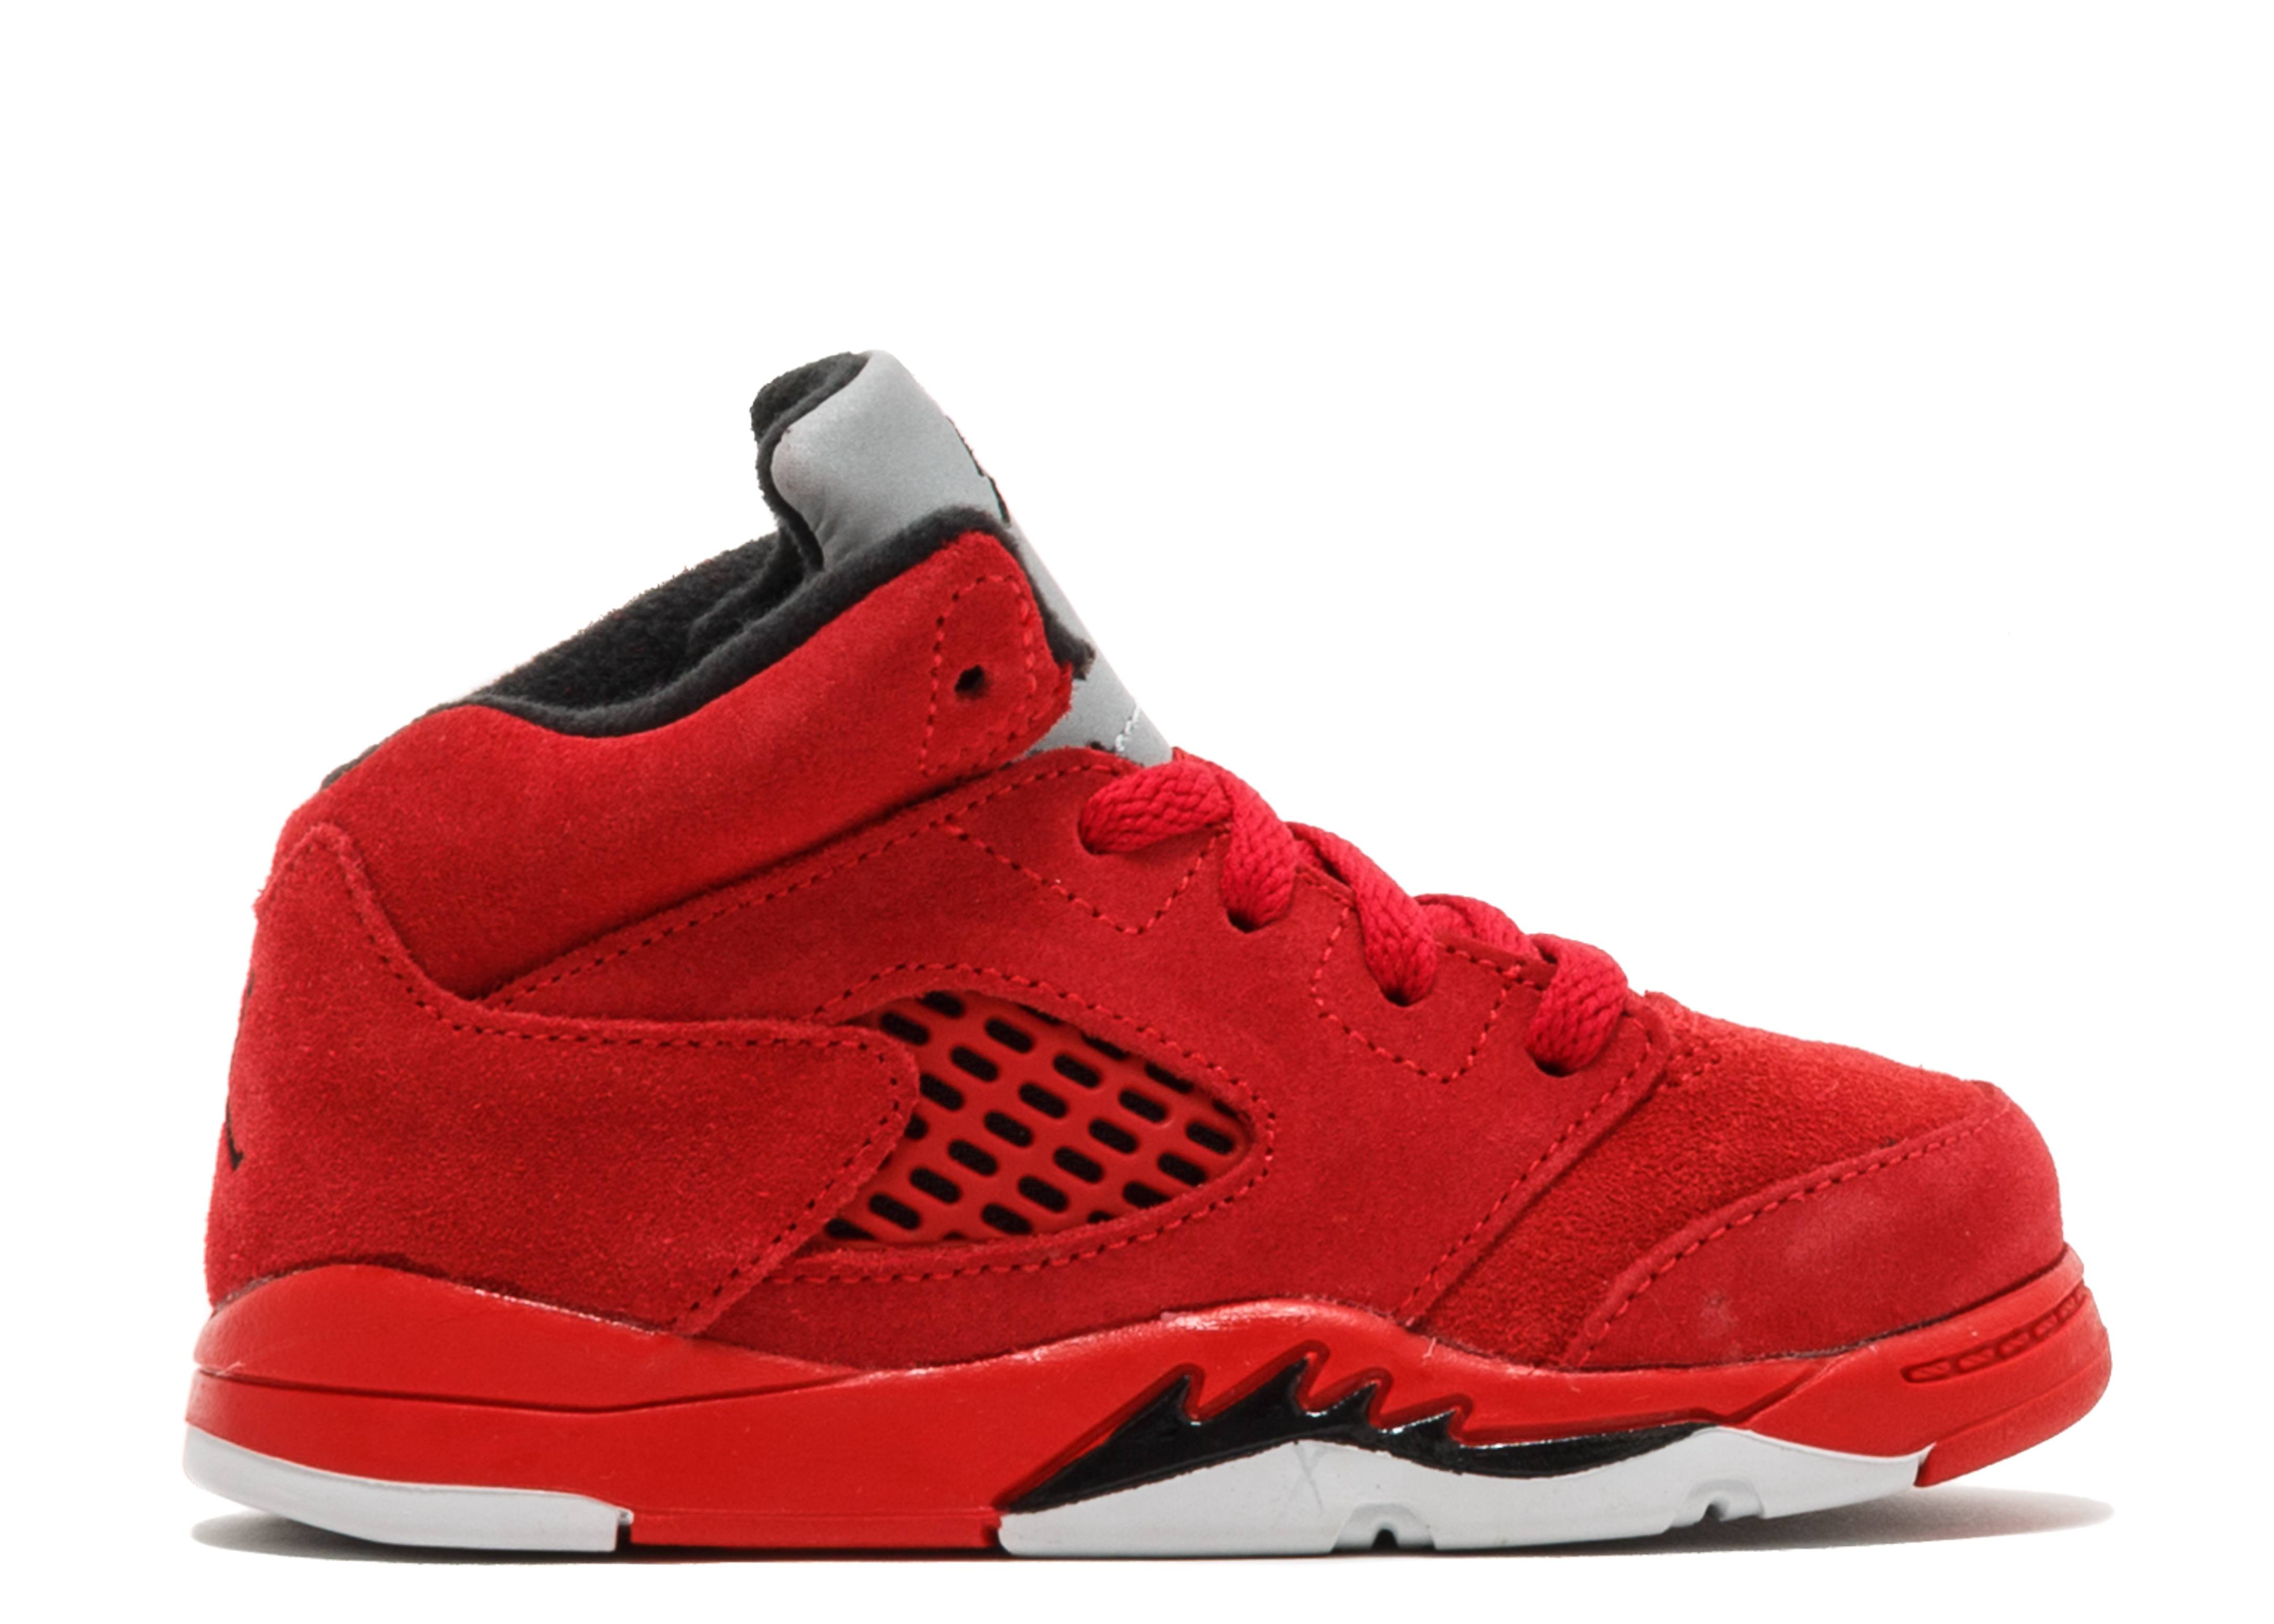 a61b8e9ff8e Air Jordan 5 (V) - Nike   Flight Club